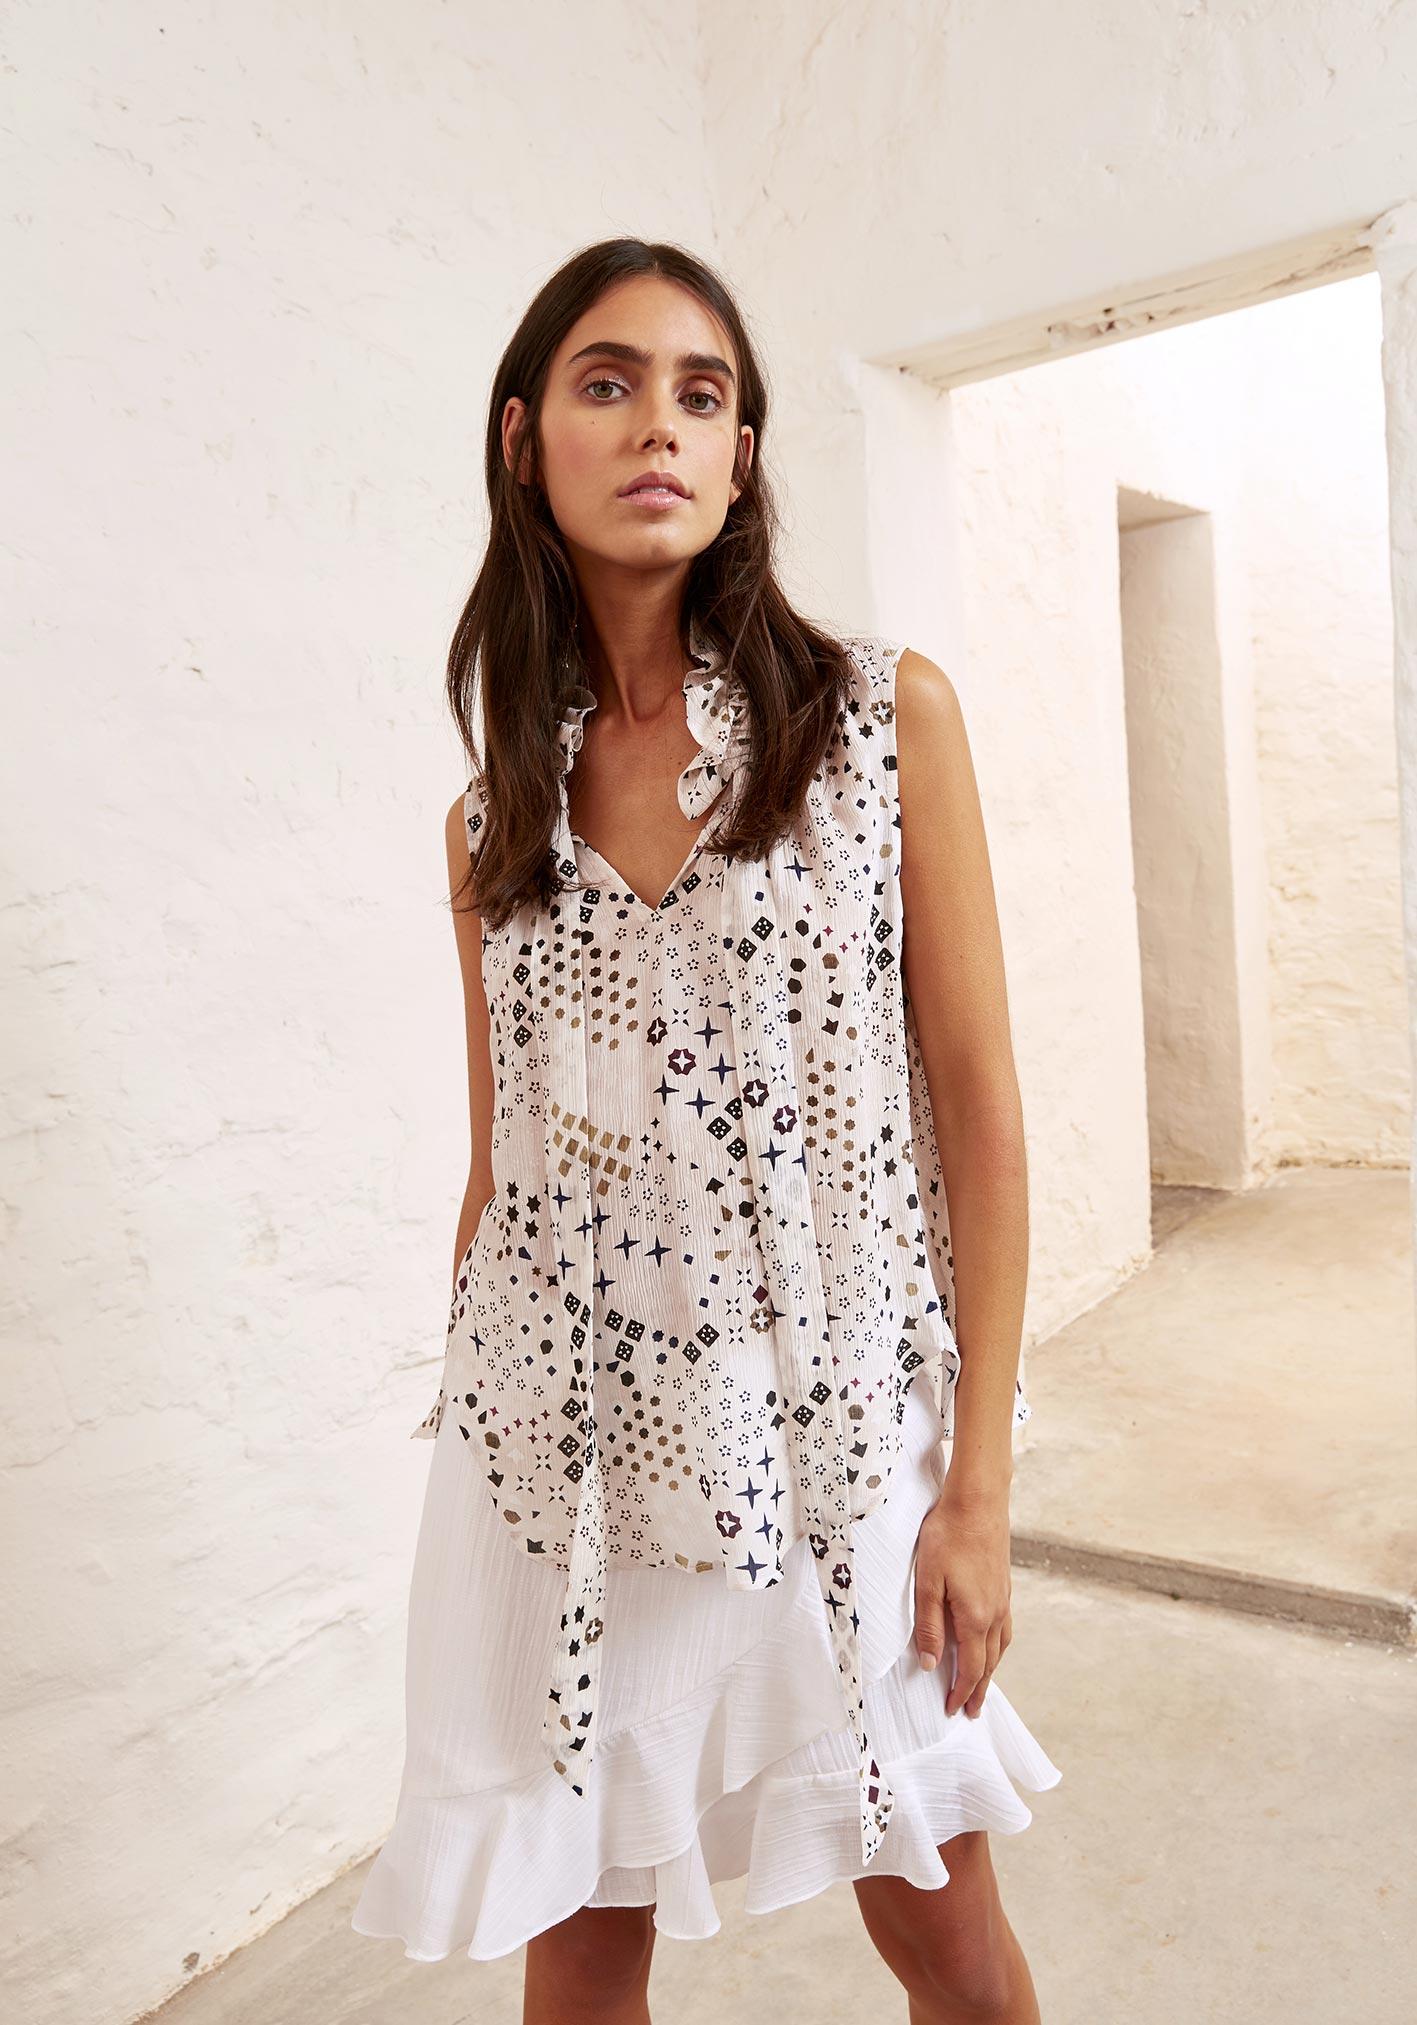 Sally Phillips - Adelaide Fashion Designer - S | S 2 1